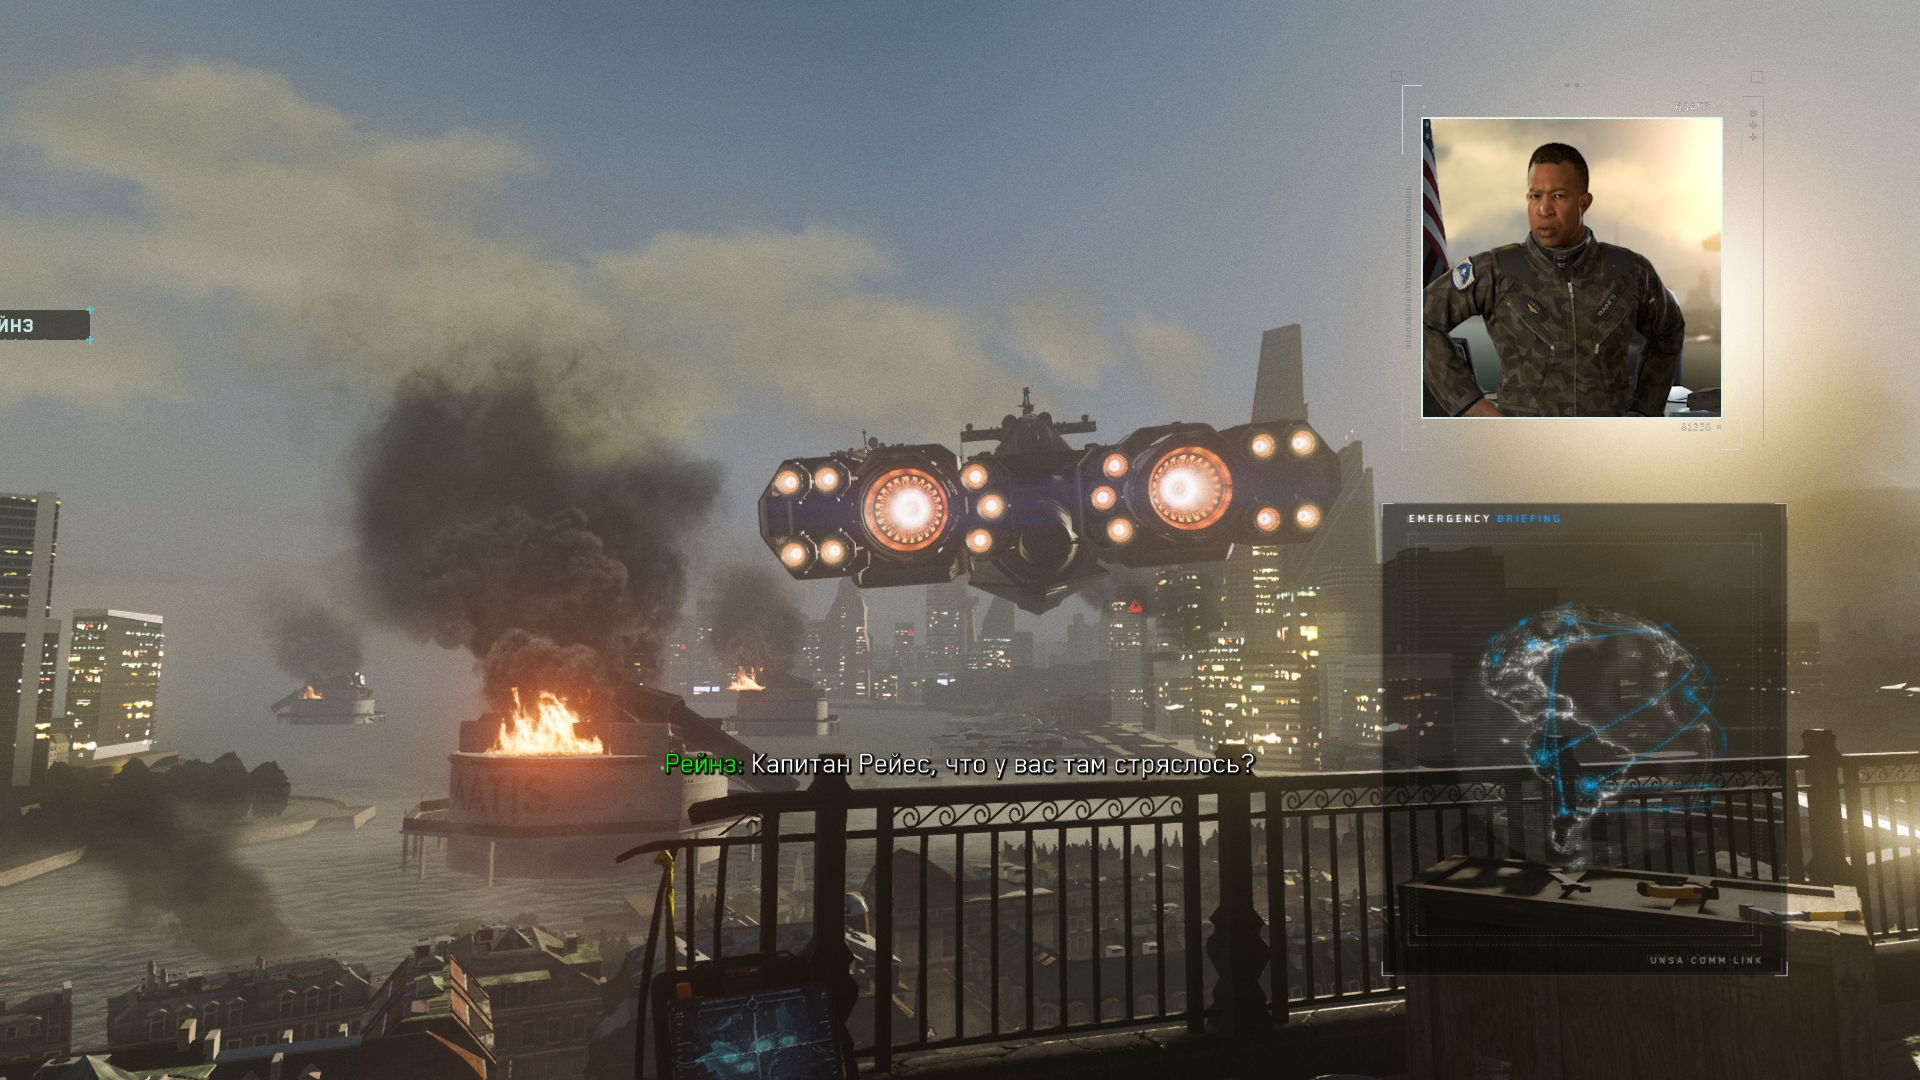 000104.Jpg - Call of Duty: Infinite Warfare